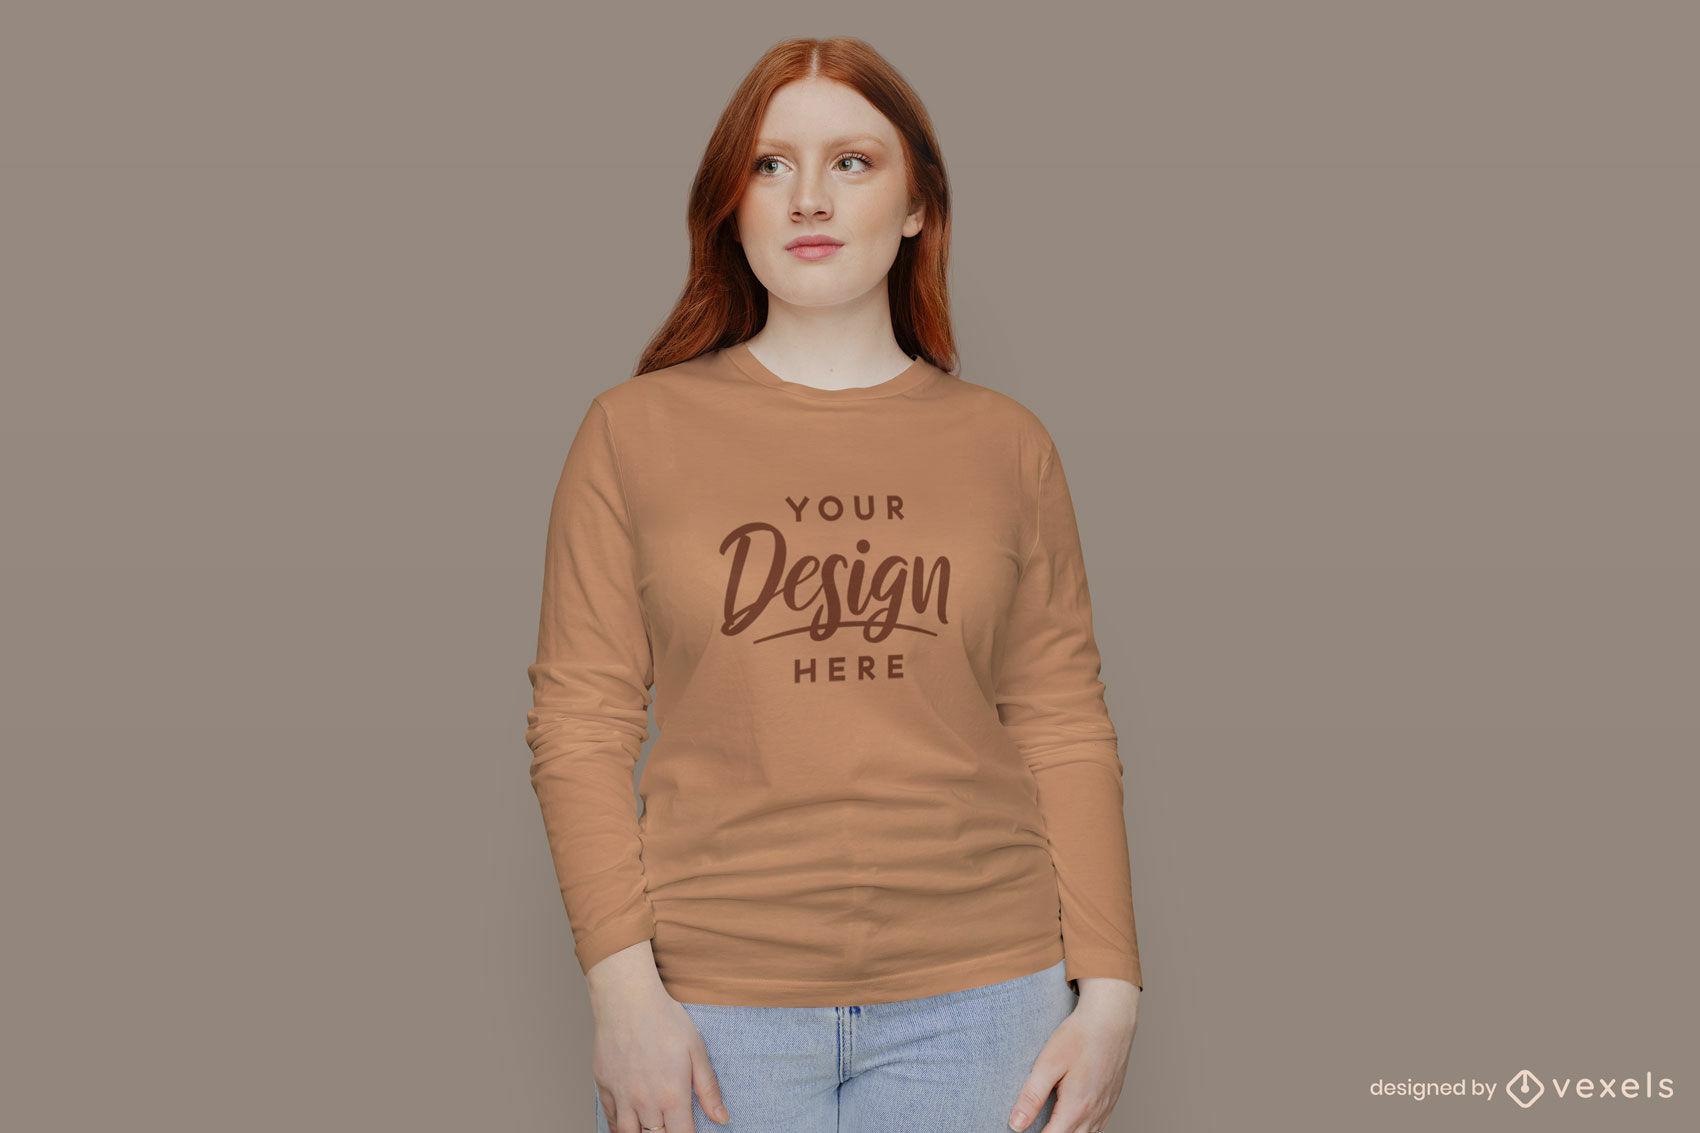 Chica en maqueta de camiseta naranja de manga larga